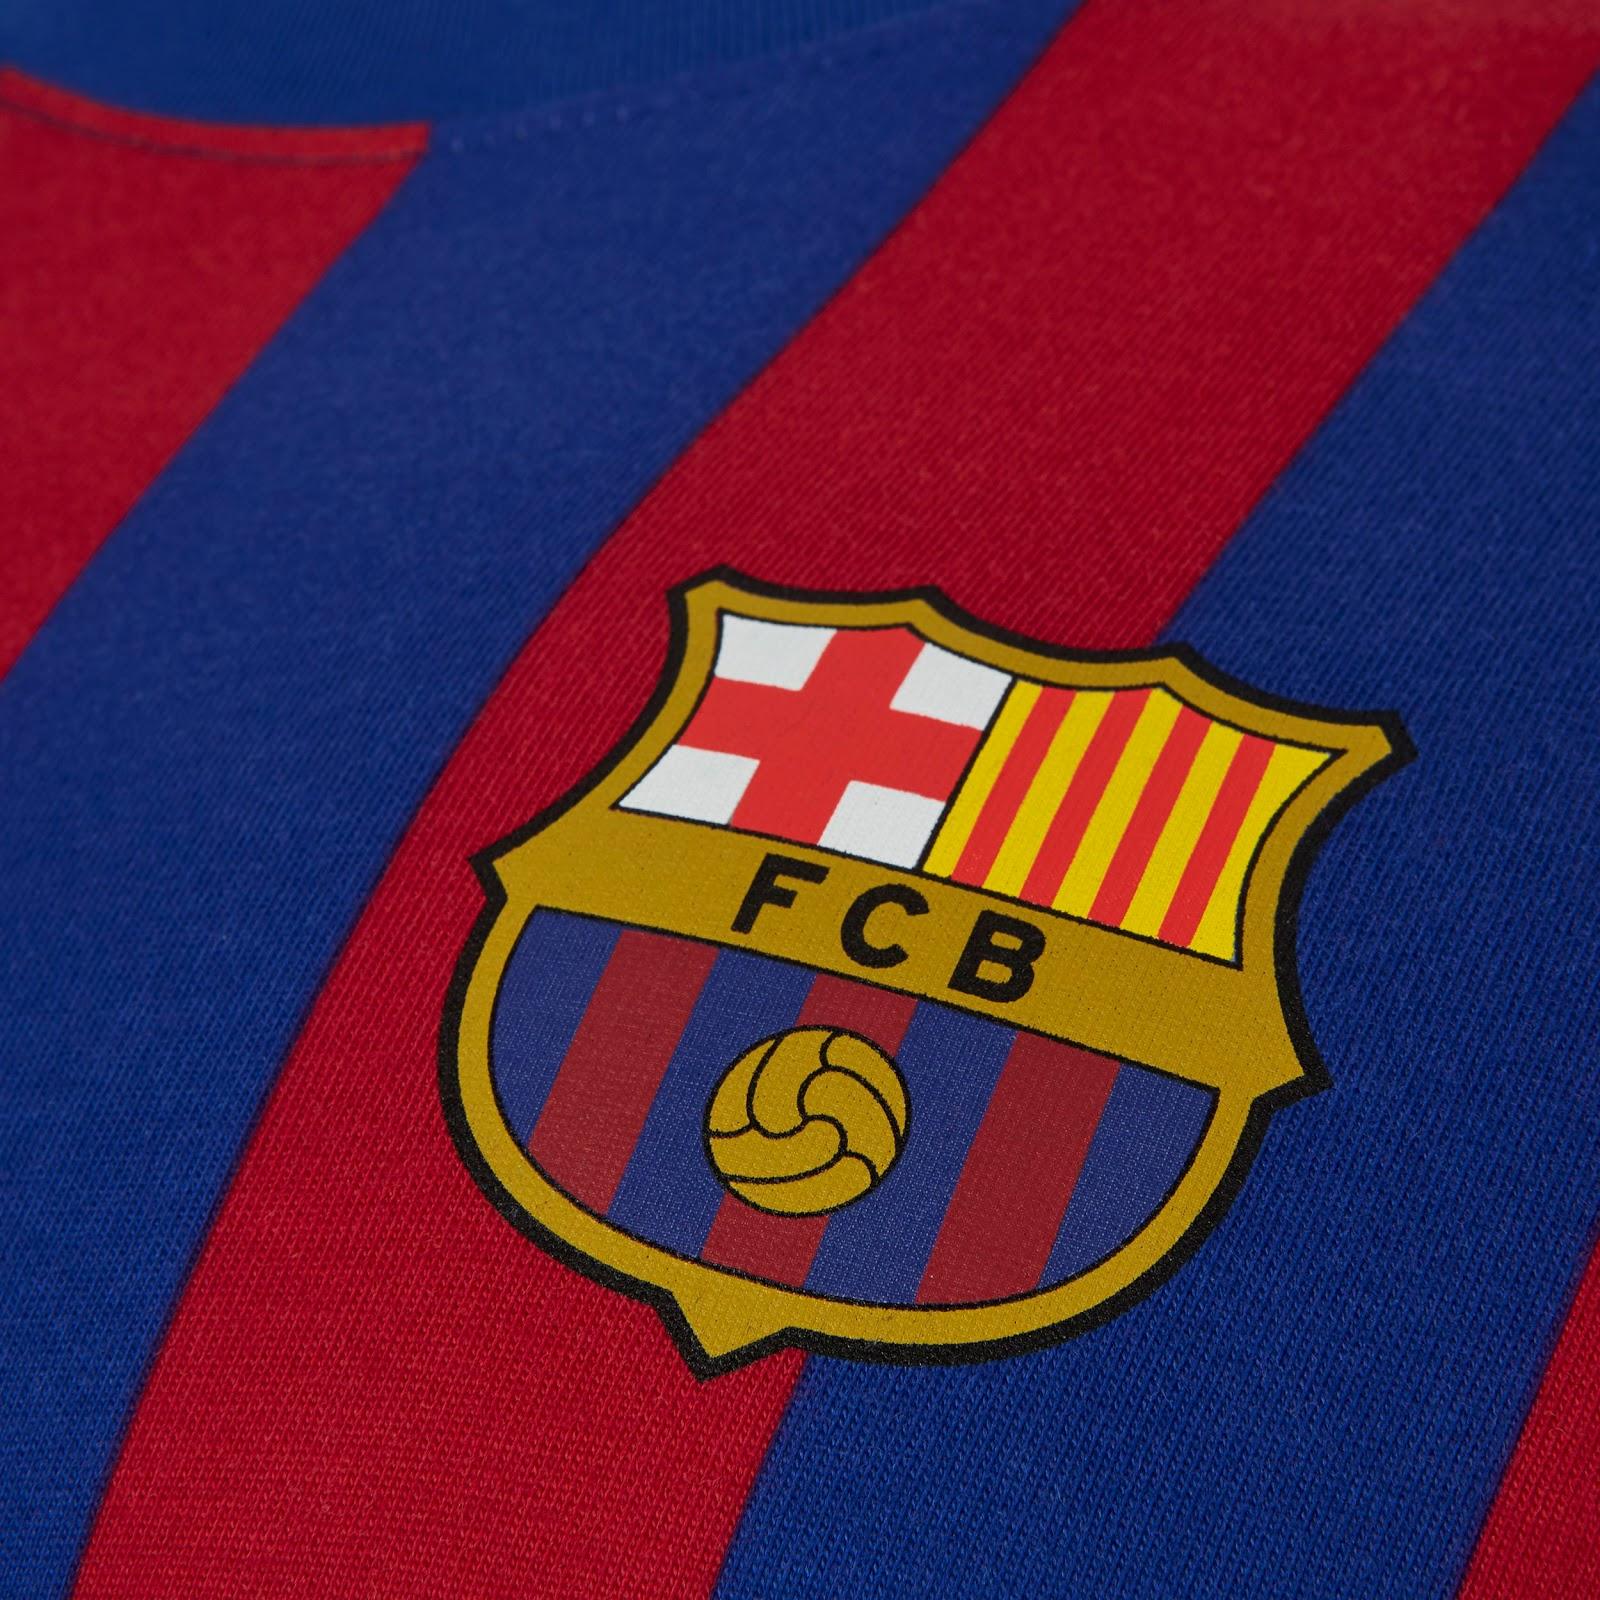 29b233aa9 The Nike FC Barcelona Long Sleeve Tee Retro is available for 35 EUR.